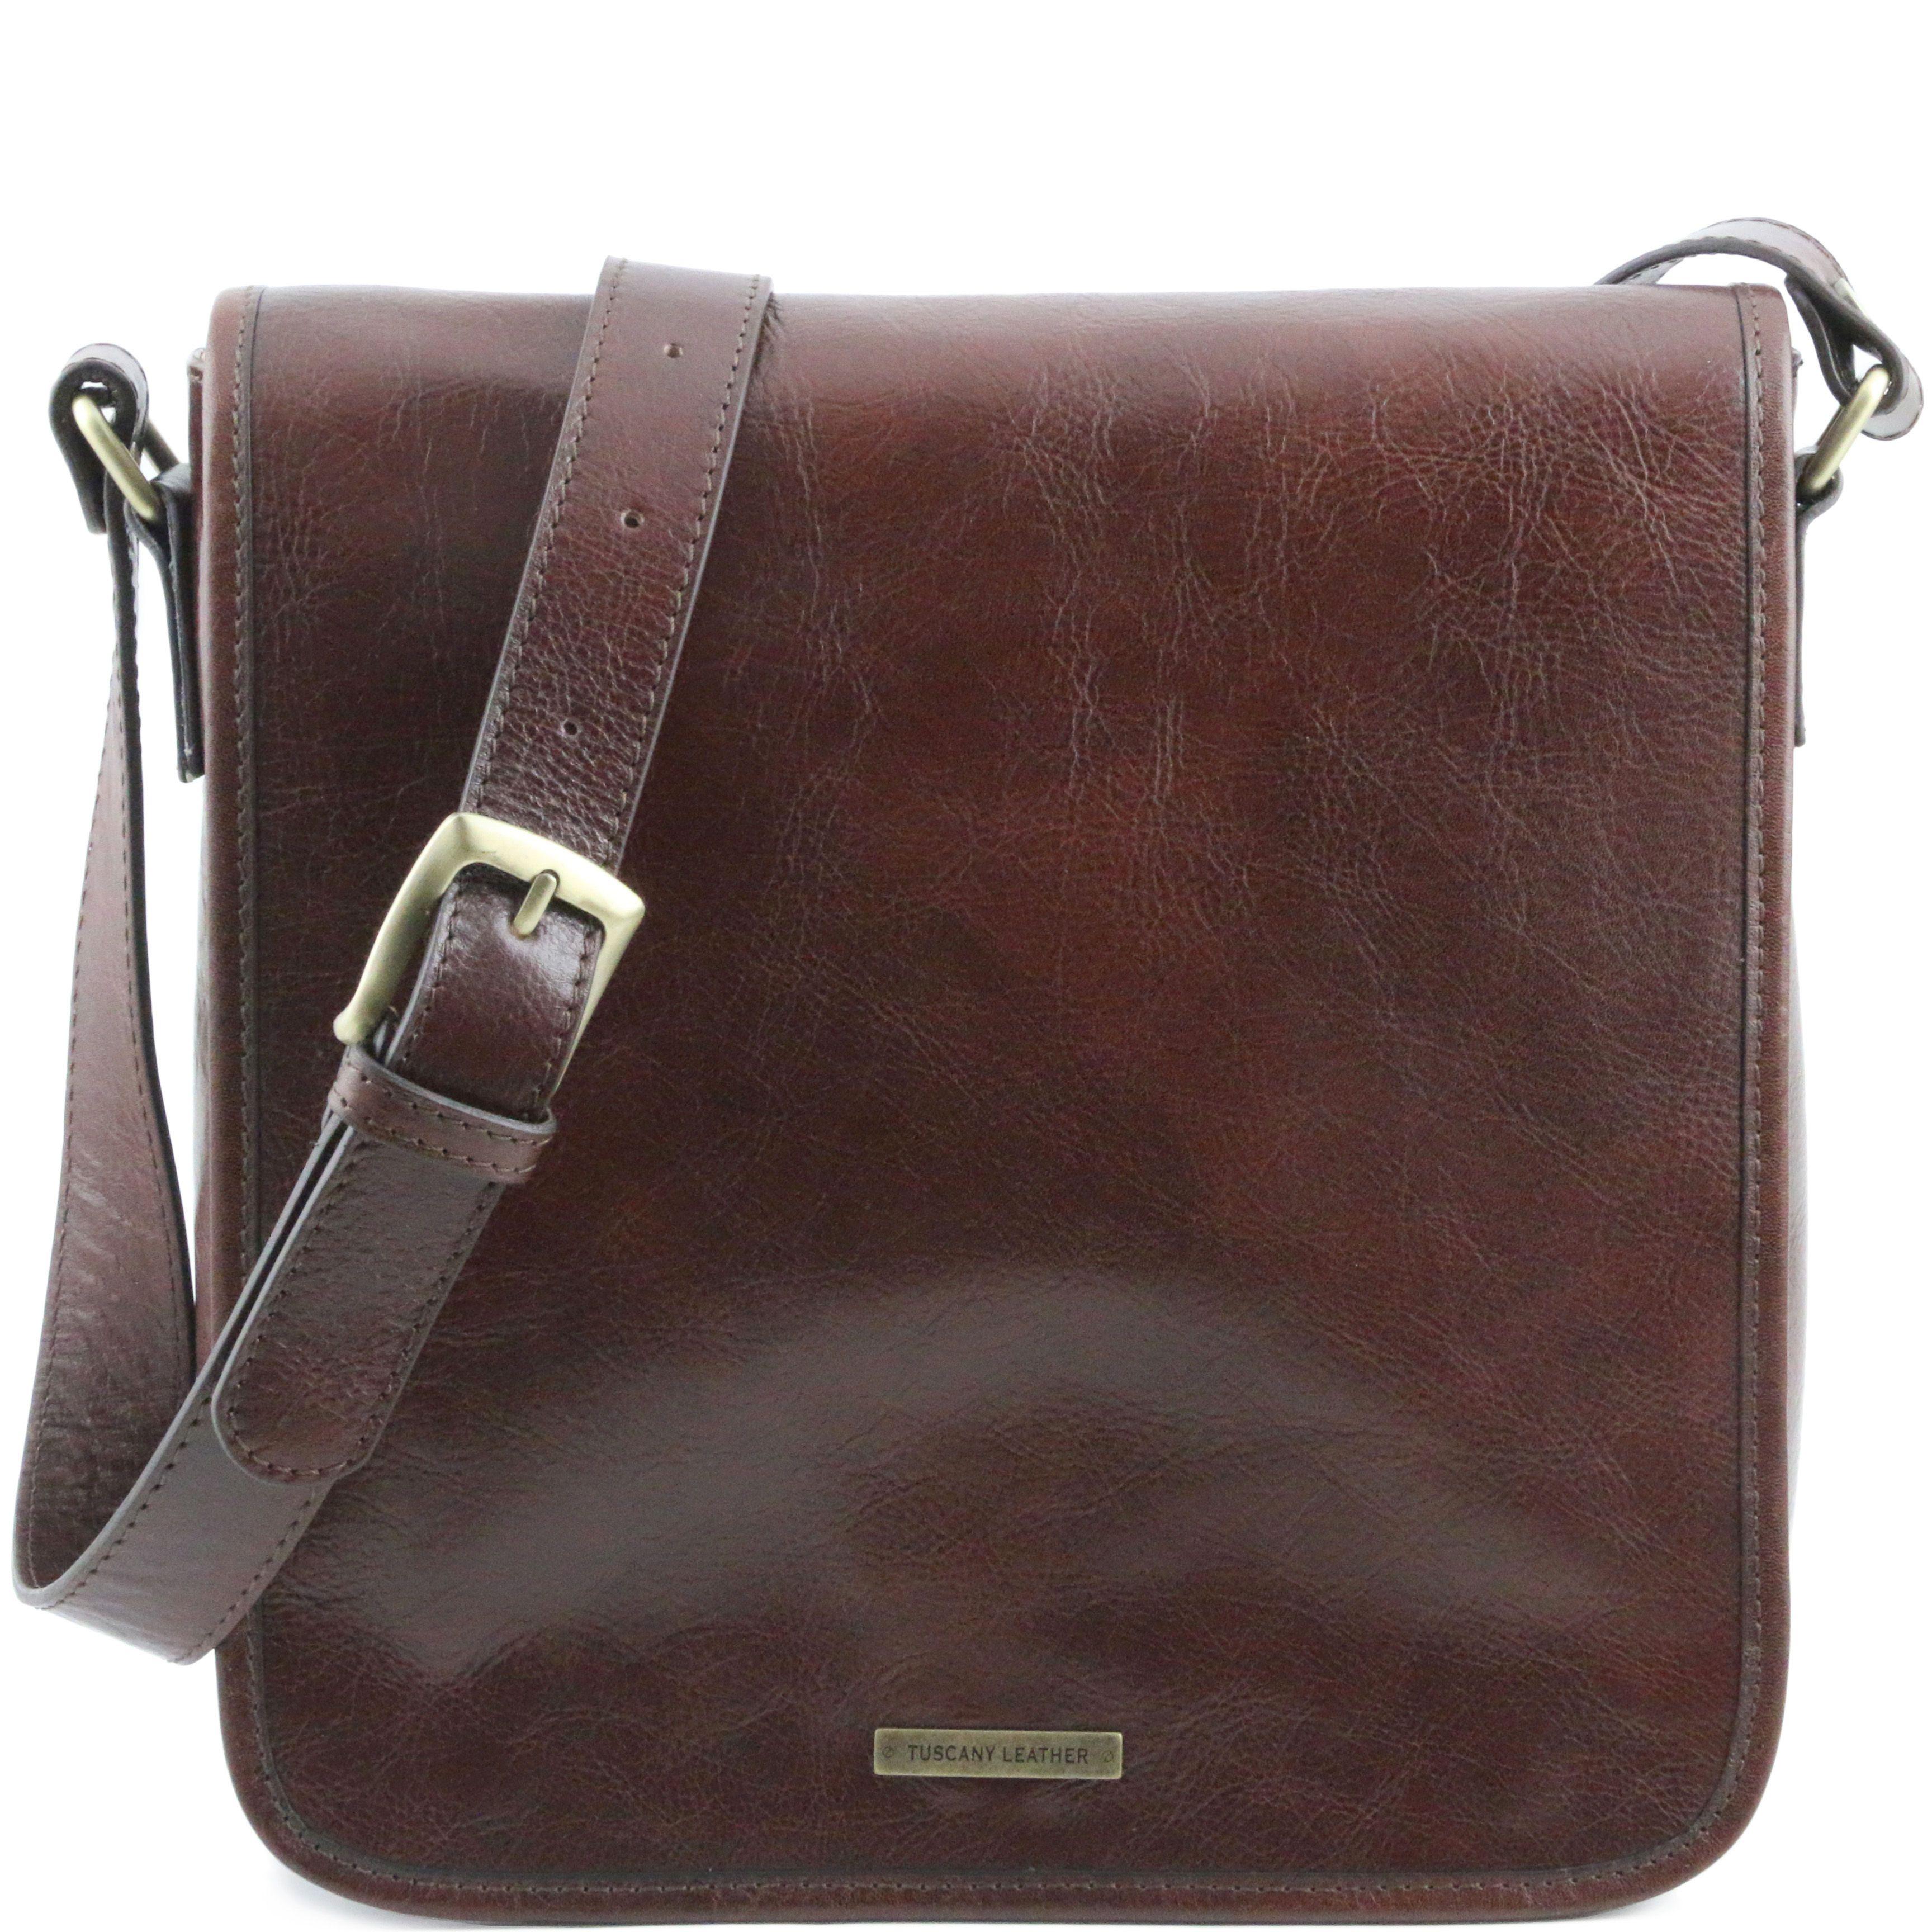 f75b40868ff7 TL Messenger One compartment leather shoulder bag